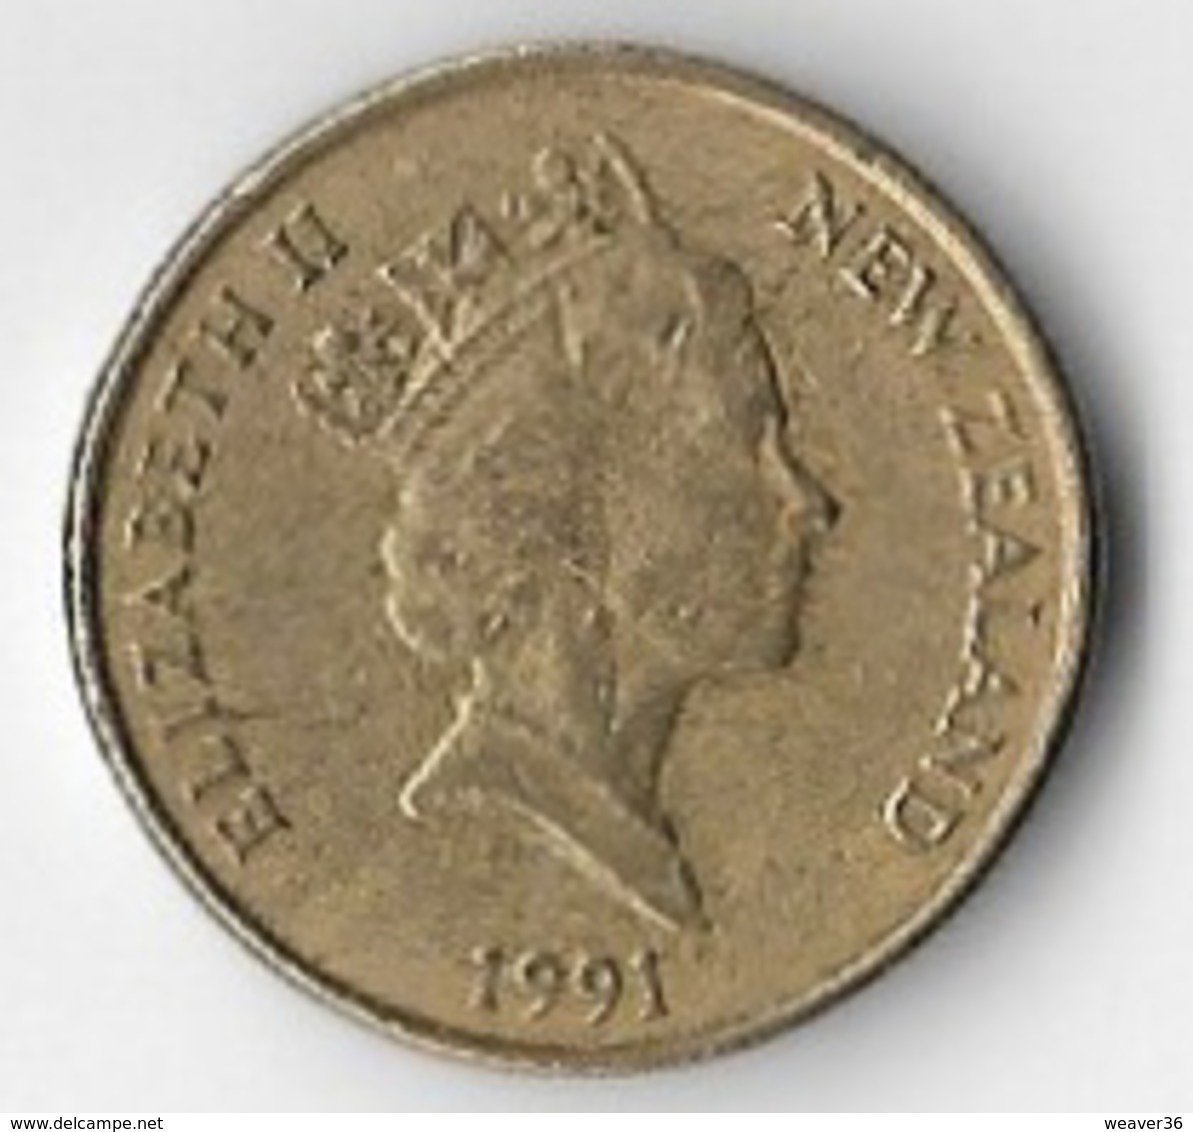 New Zealand 1991 $1 [C808/2D] - New Zealand